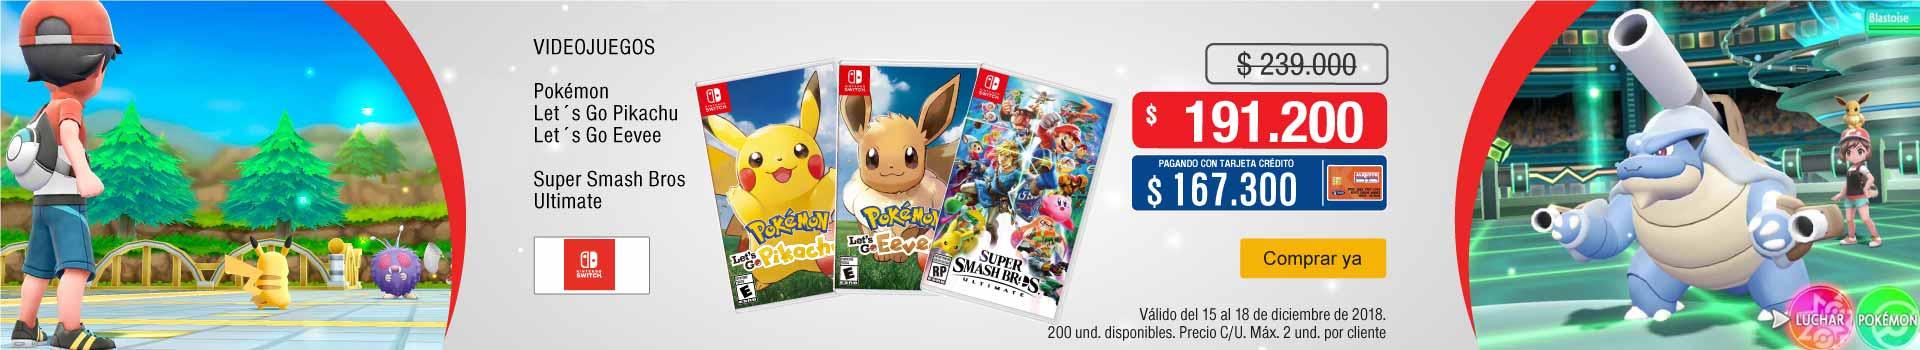 AK-KT-BCAT-3-VIDEOJ-NIN-DCAT-SWITCH-VIDEOJUEGOS-Pokémon-Super- Smash -DICIEMBRE-15